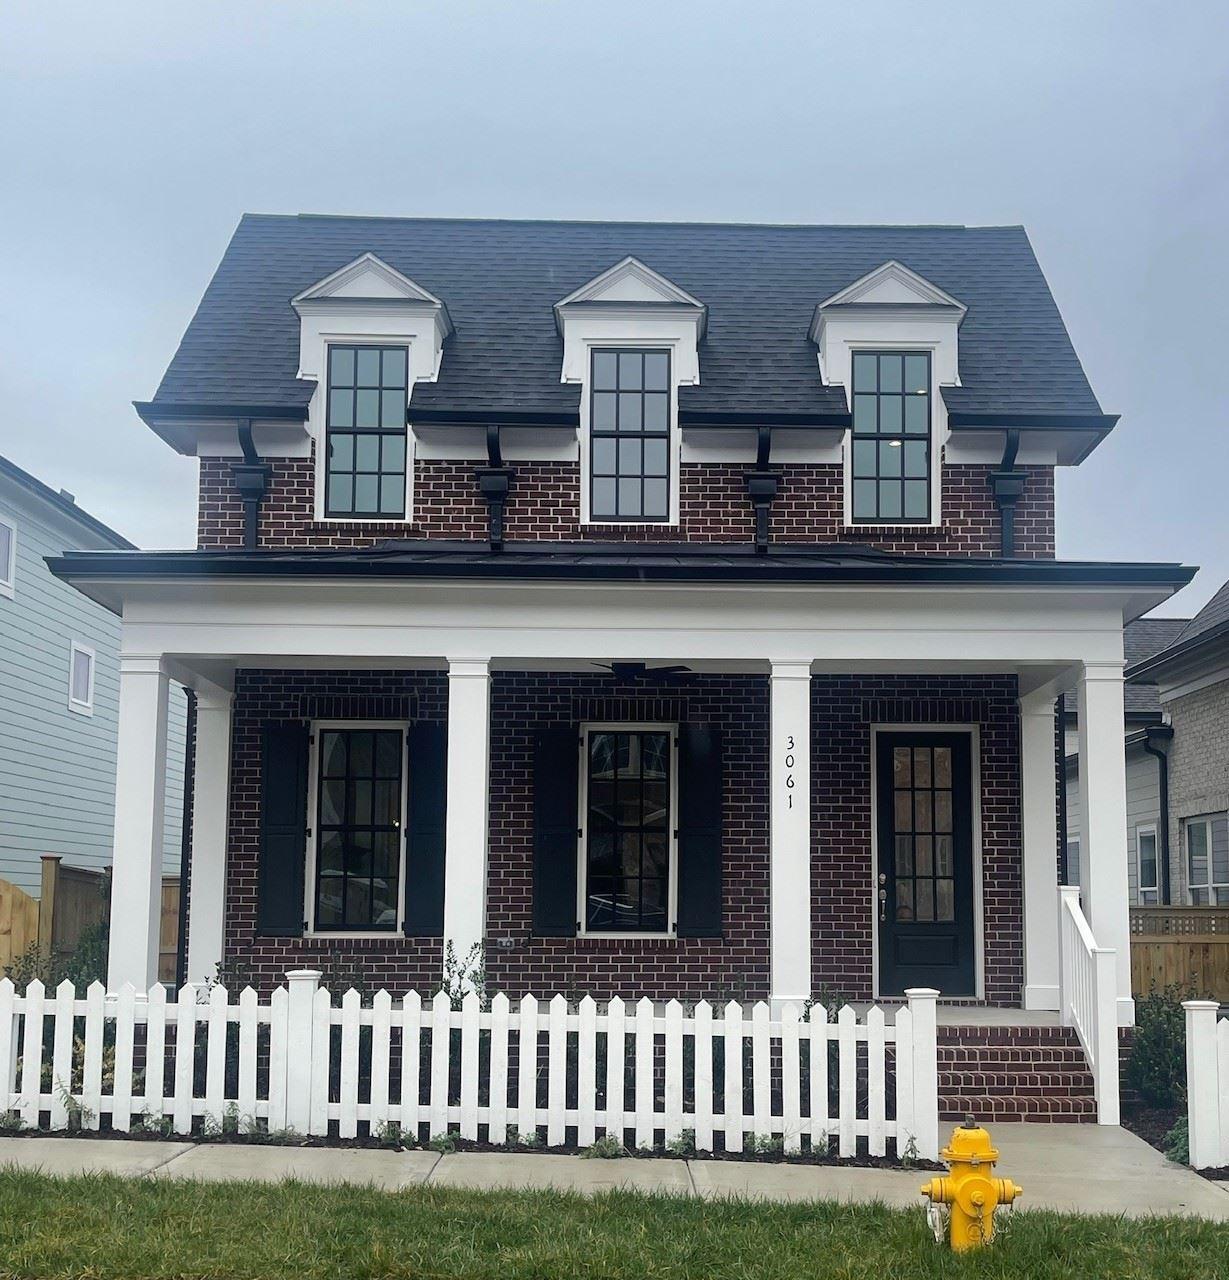 Photo of 3061 Conar Street, Lot # 2202, Franklin, TN 37064 (MLS # 2276892)